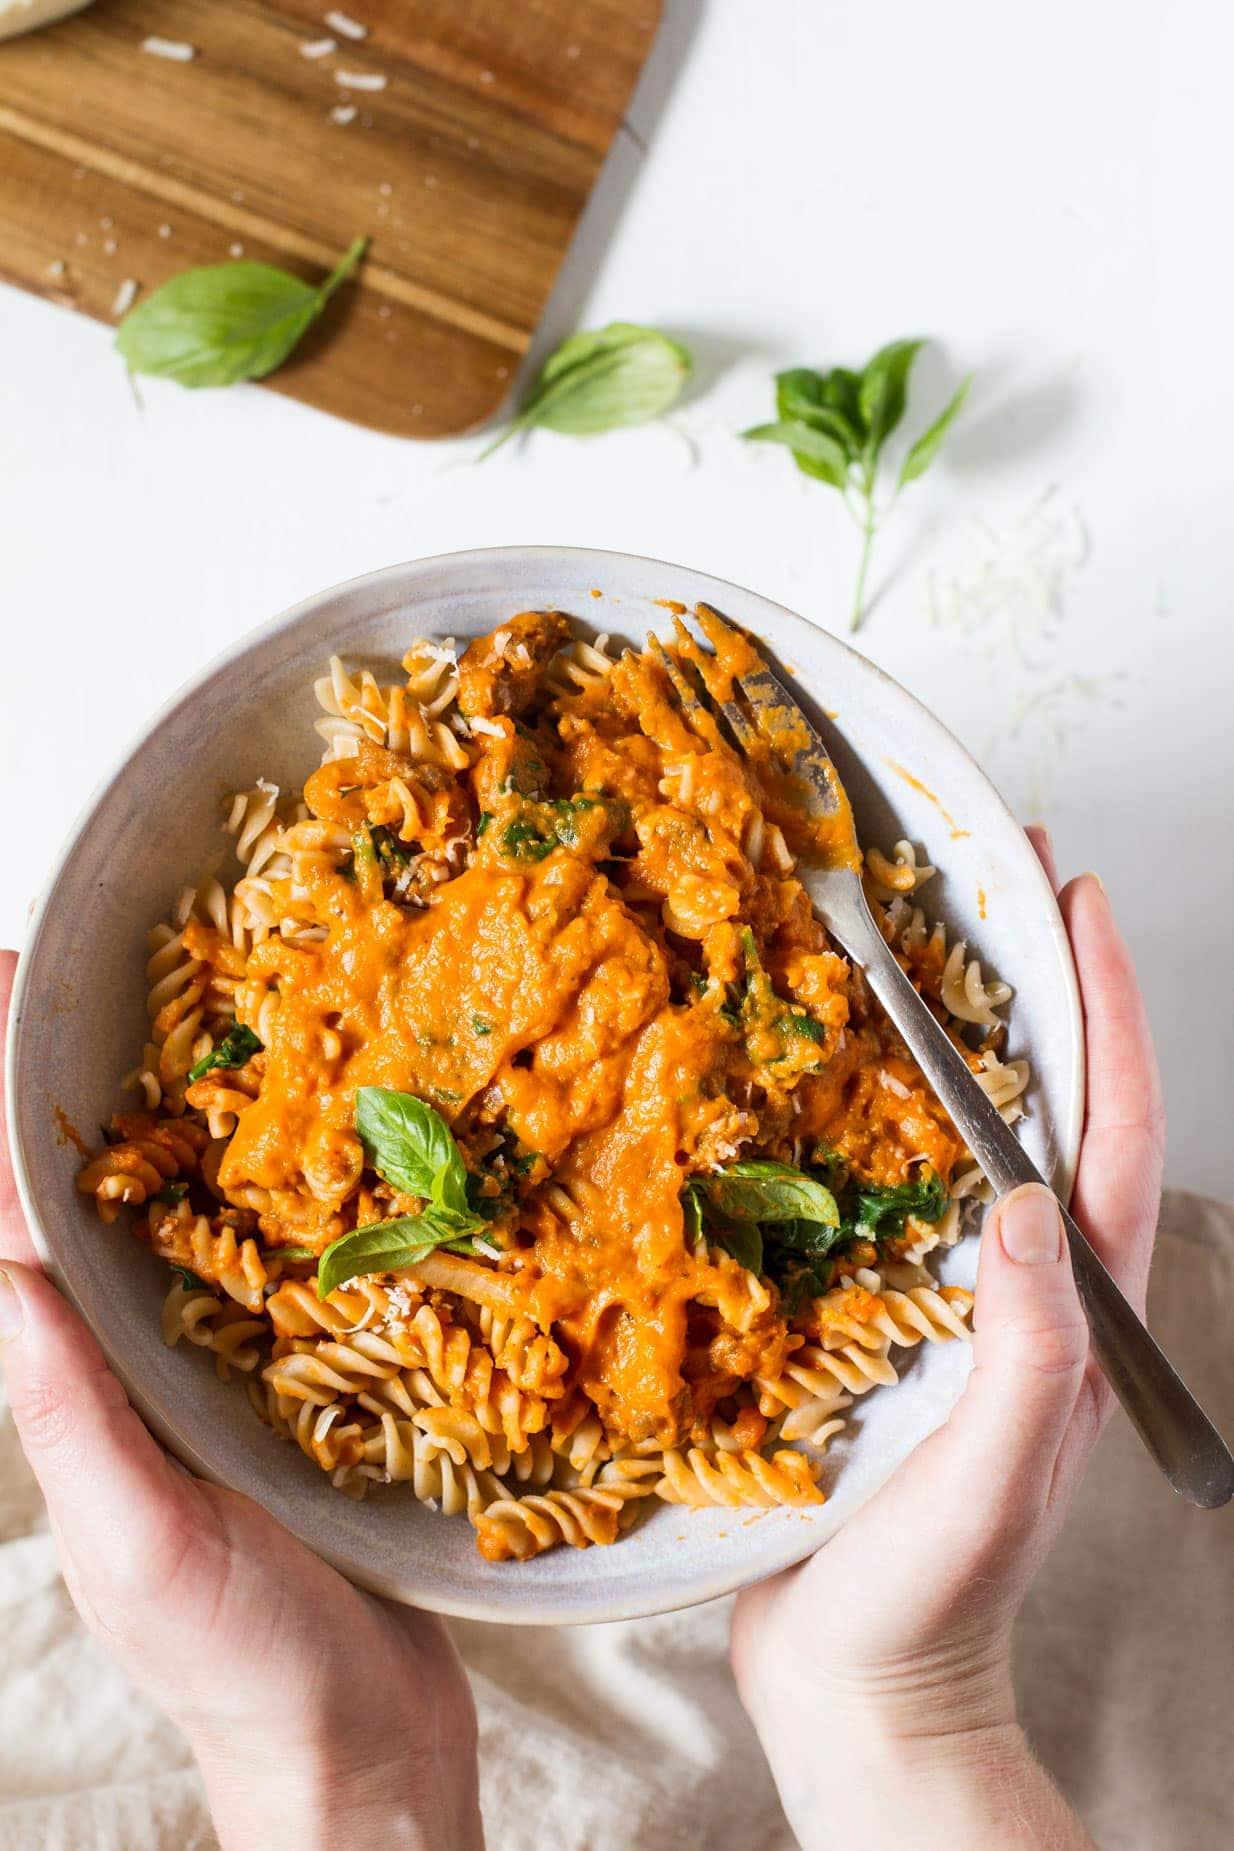 Hands holding a bowl of Creamy Parmesan Pumpkin Pasta